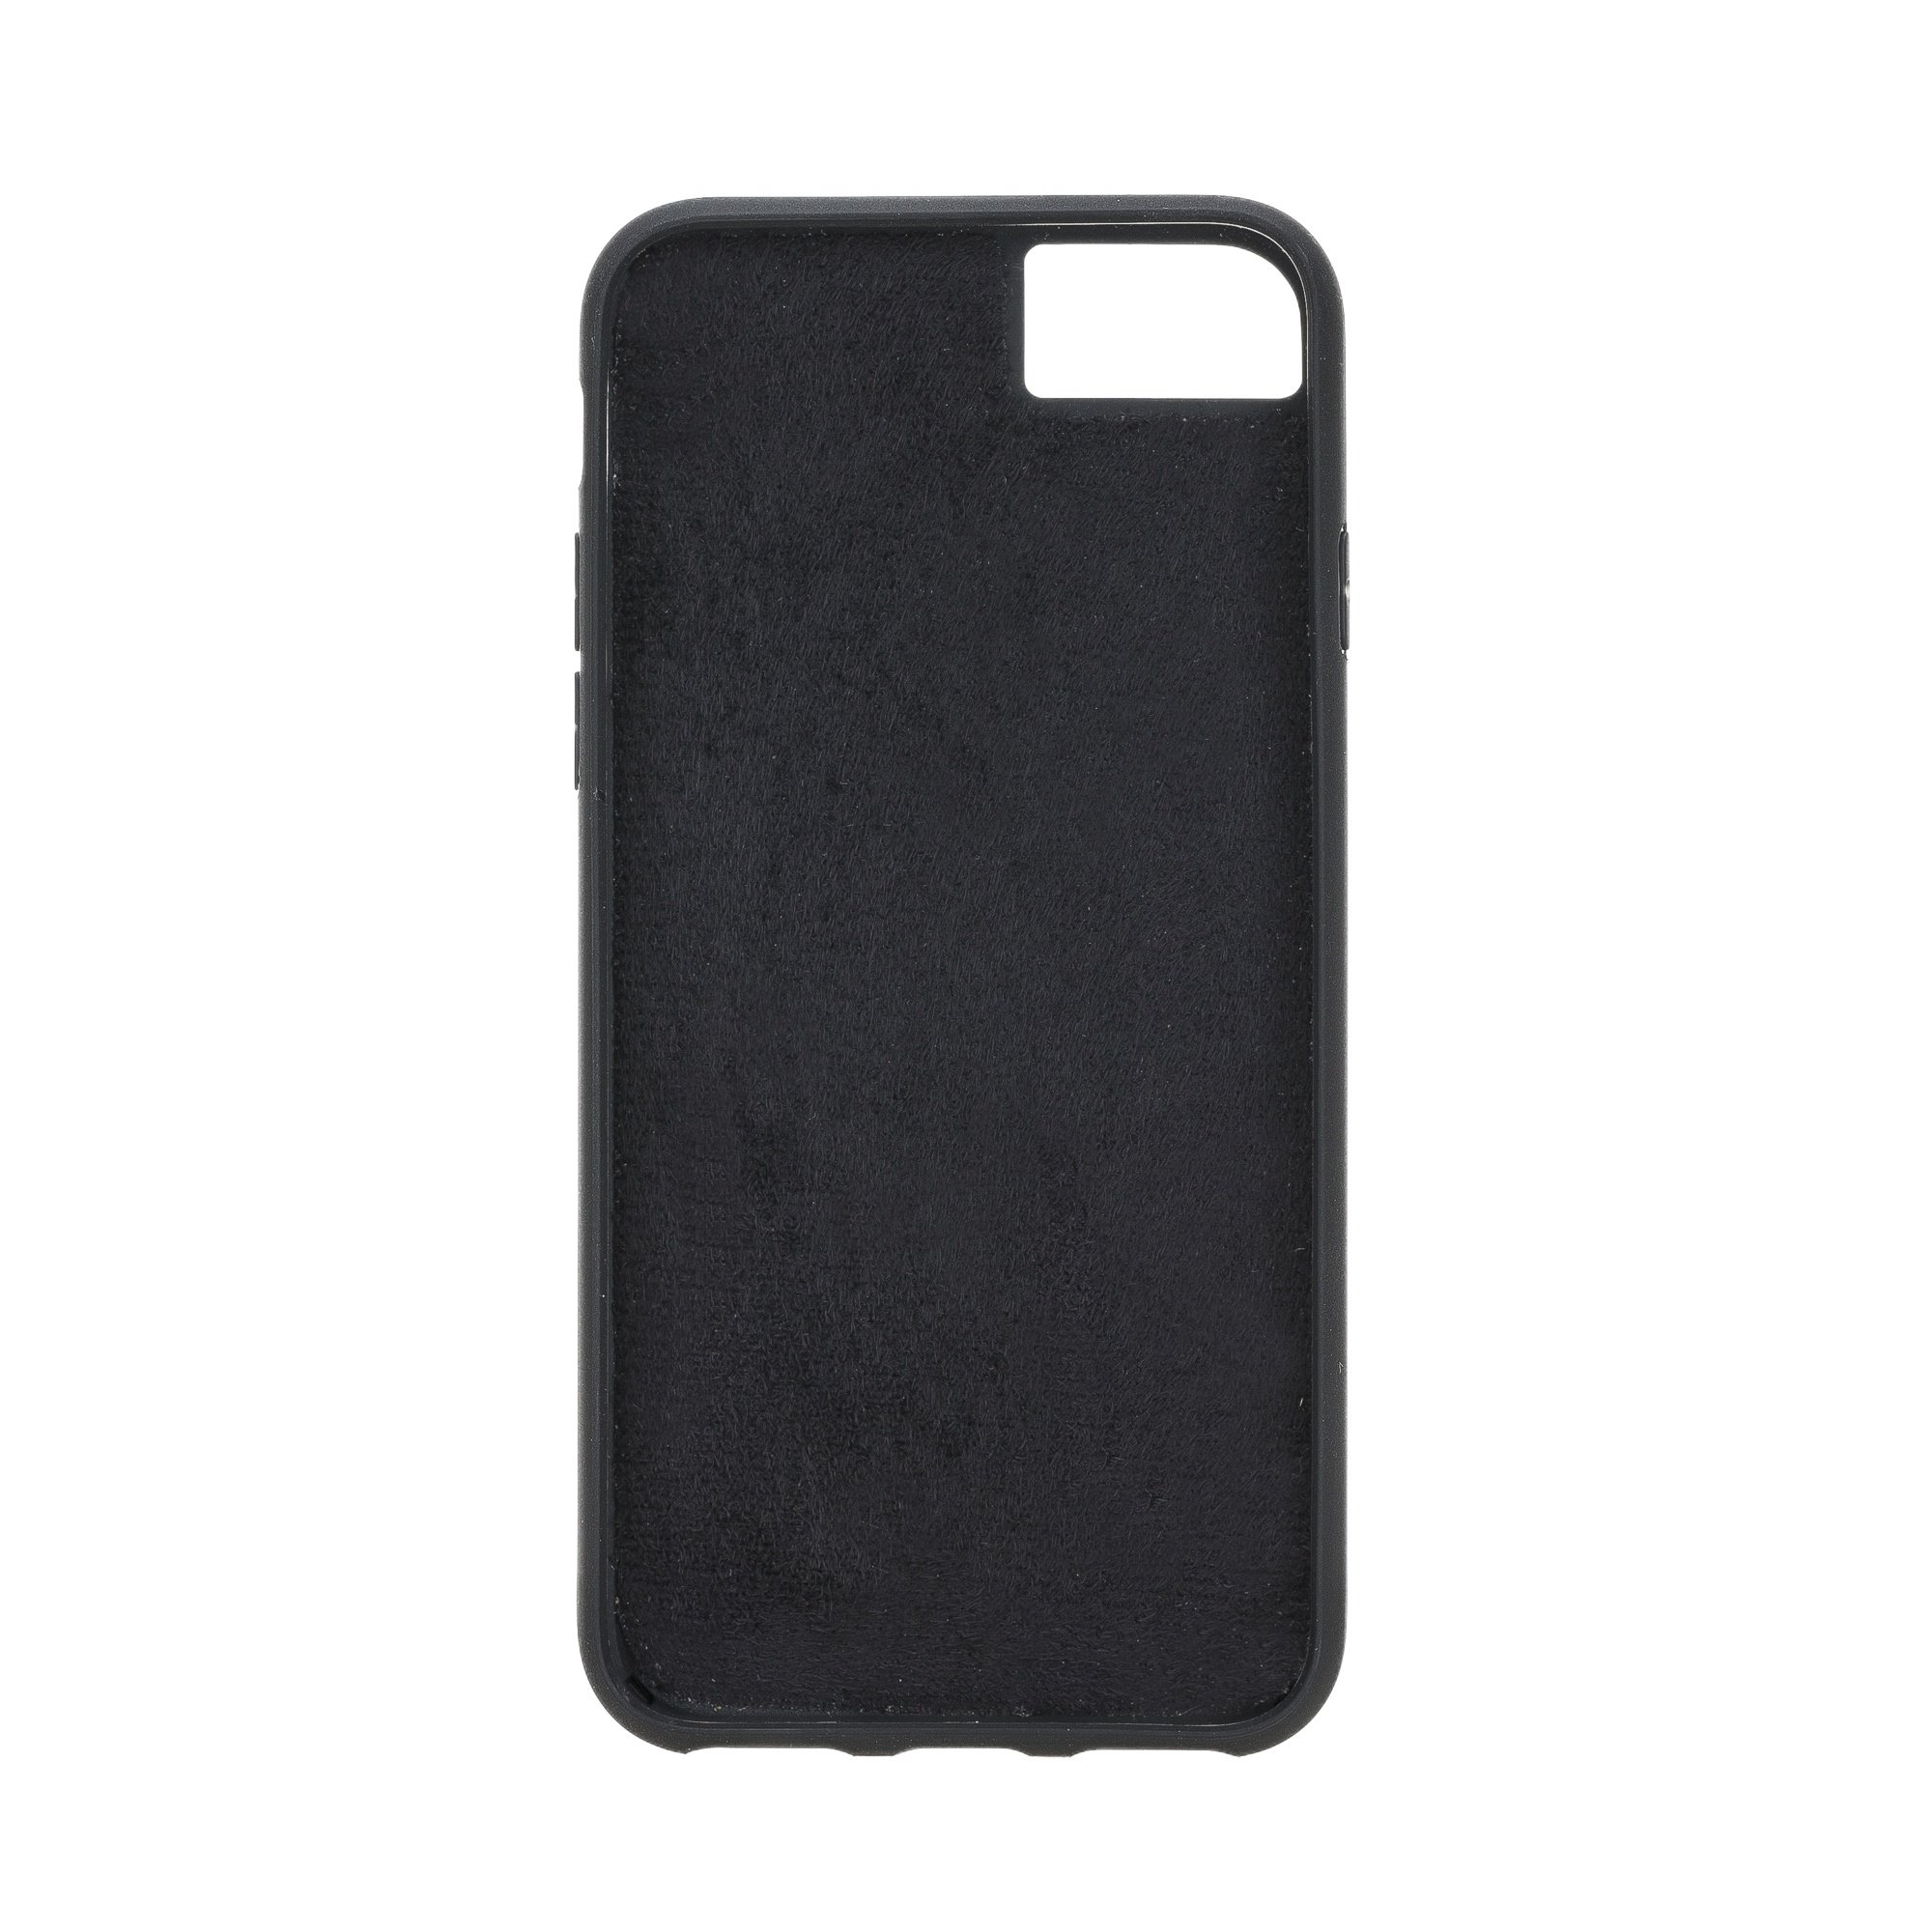 Solo Pelle iPhone SE 2020 / 7 / 8 abnehmbare Lederhülle (2in1) inkl. Kartenfächer für das original iPhone 7/8 (Matt Schwarz)